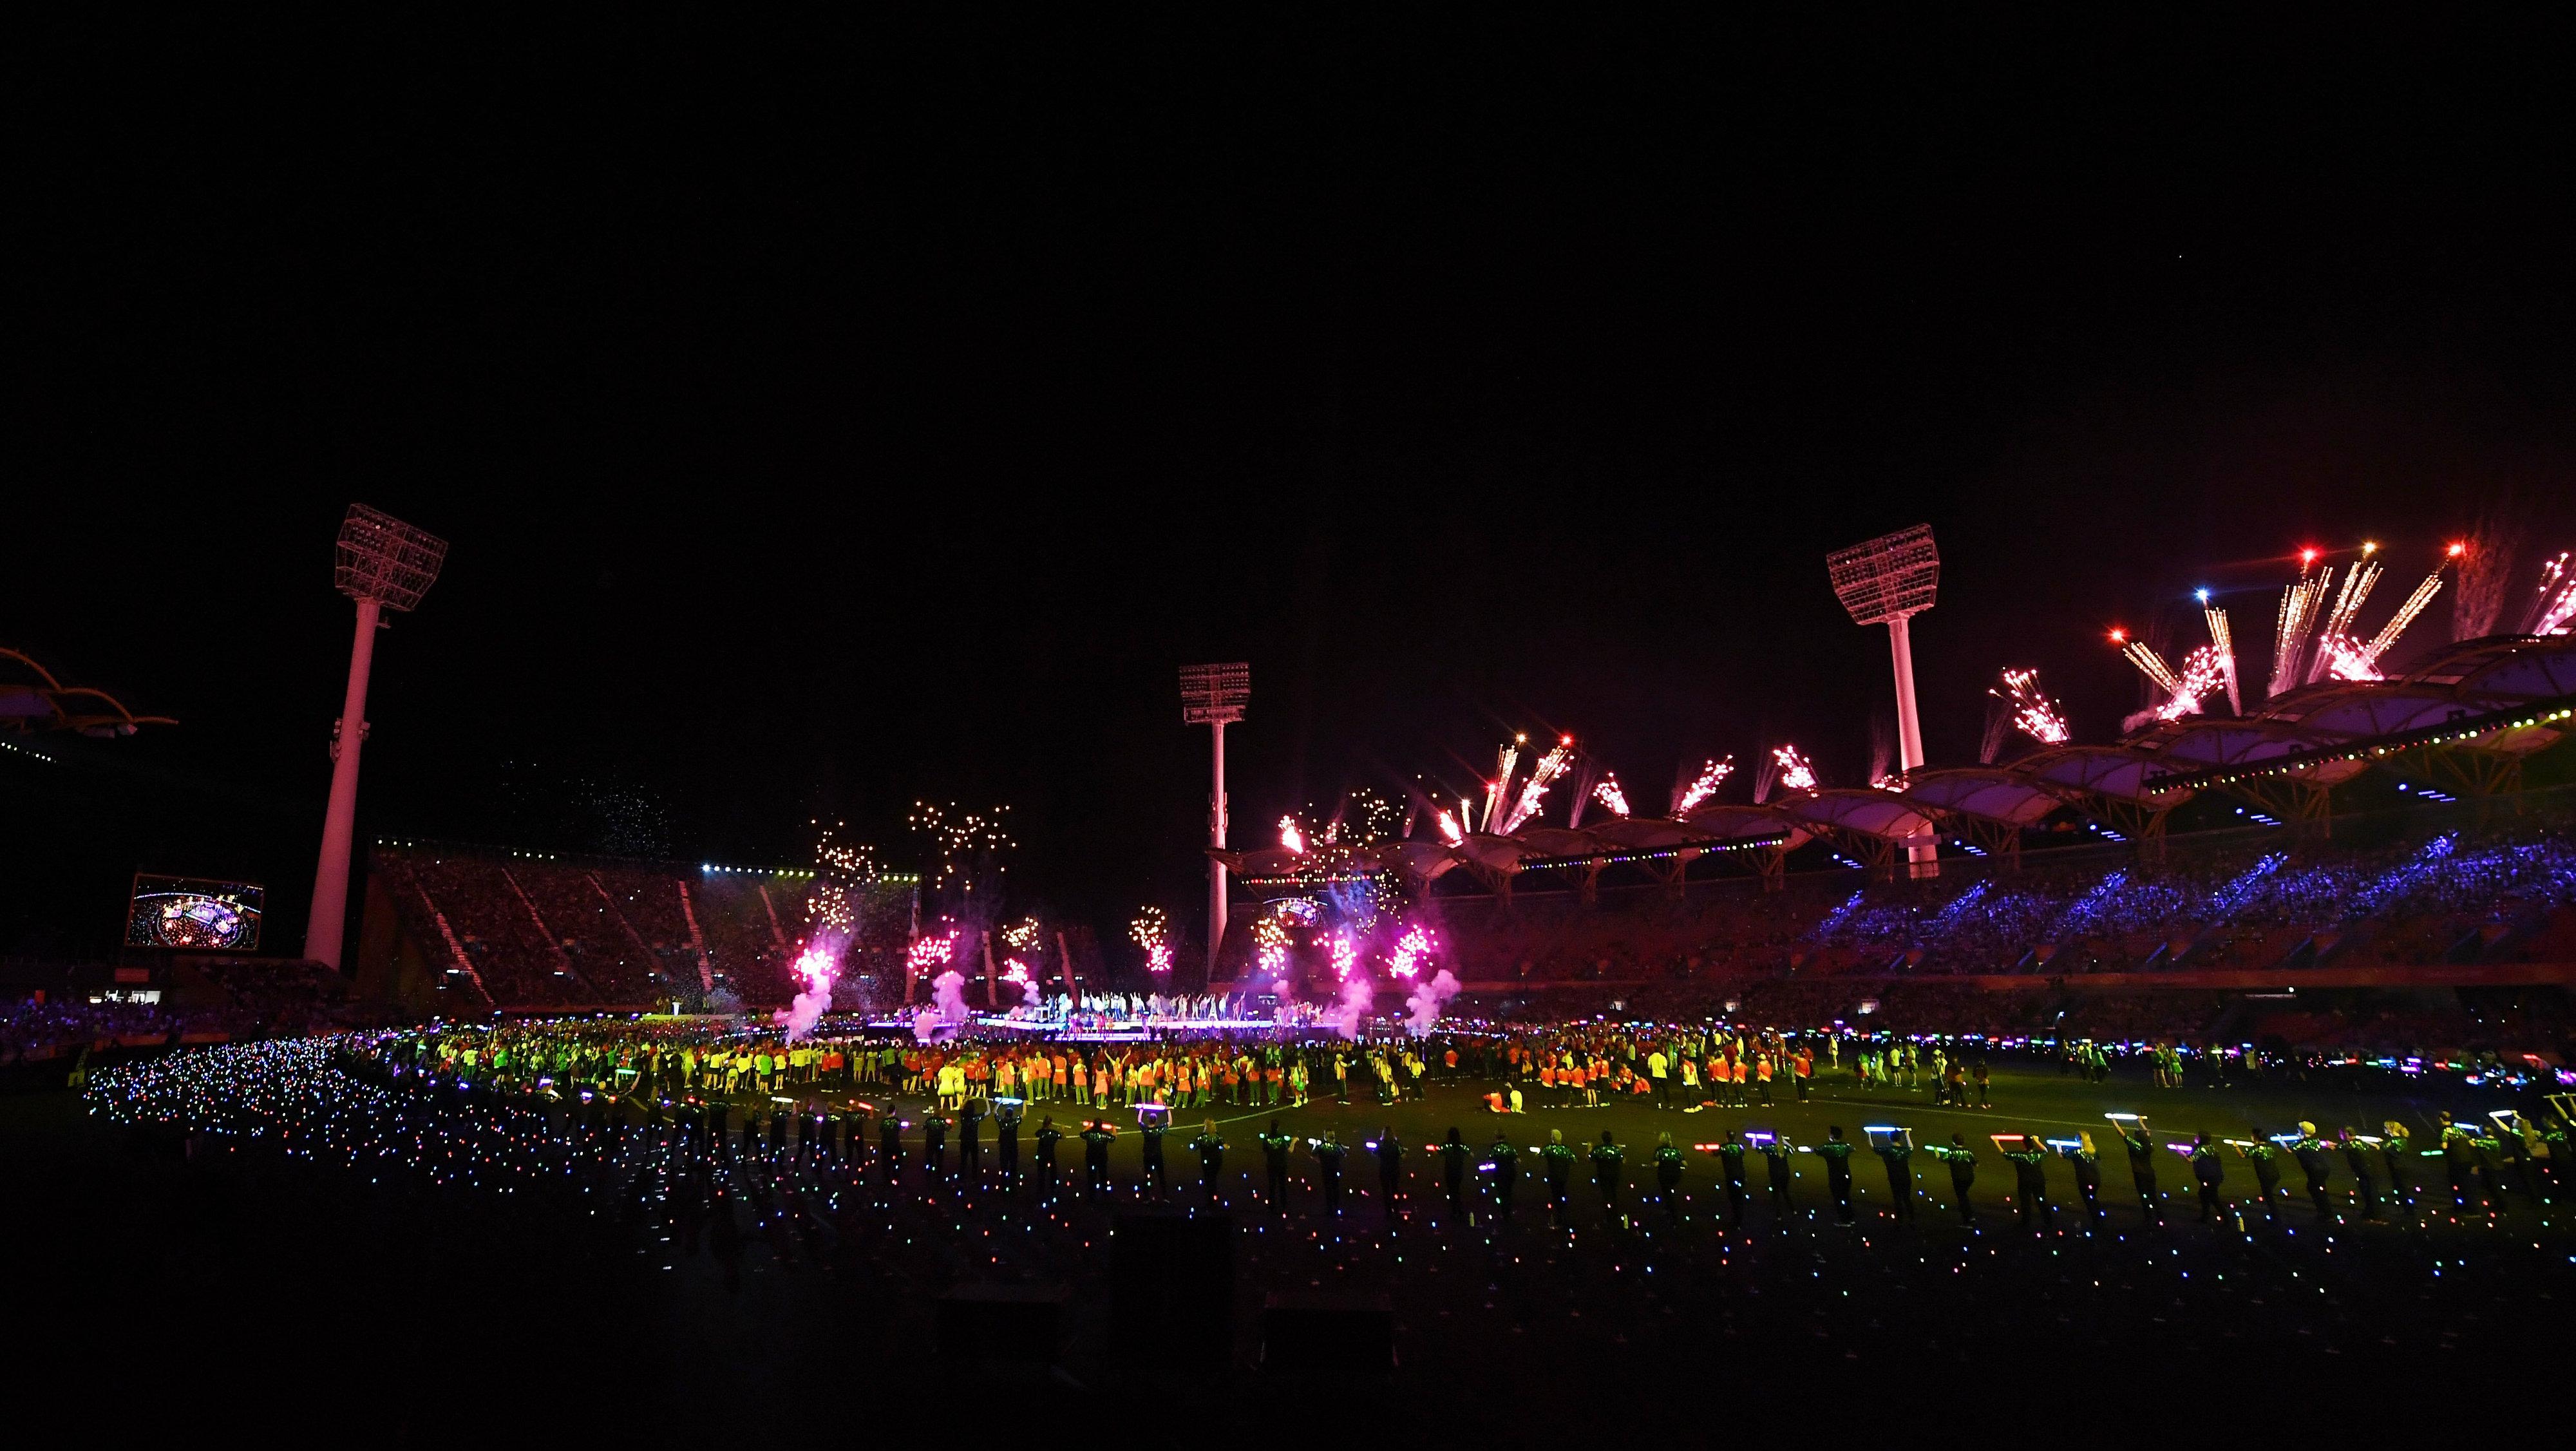 2018 Commonwealth Games closing ceremony